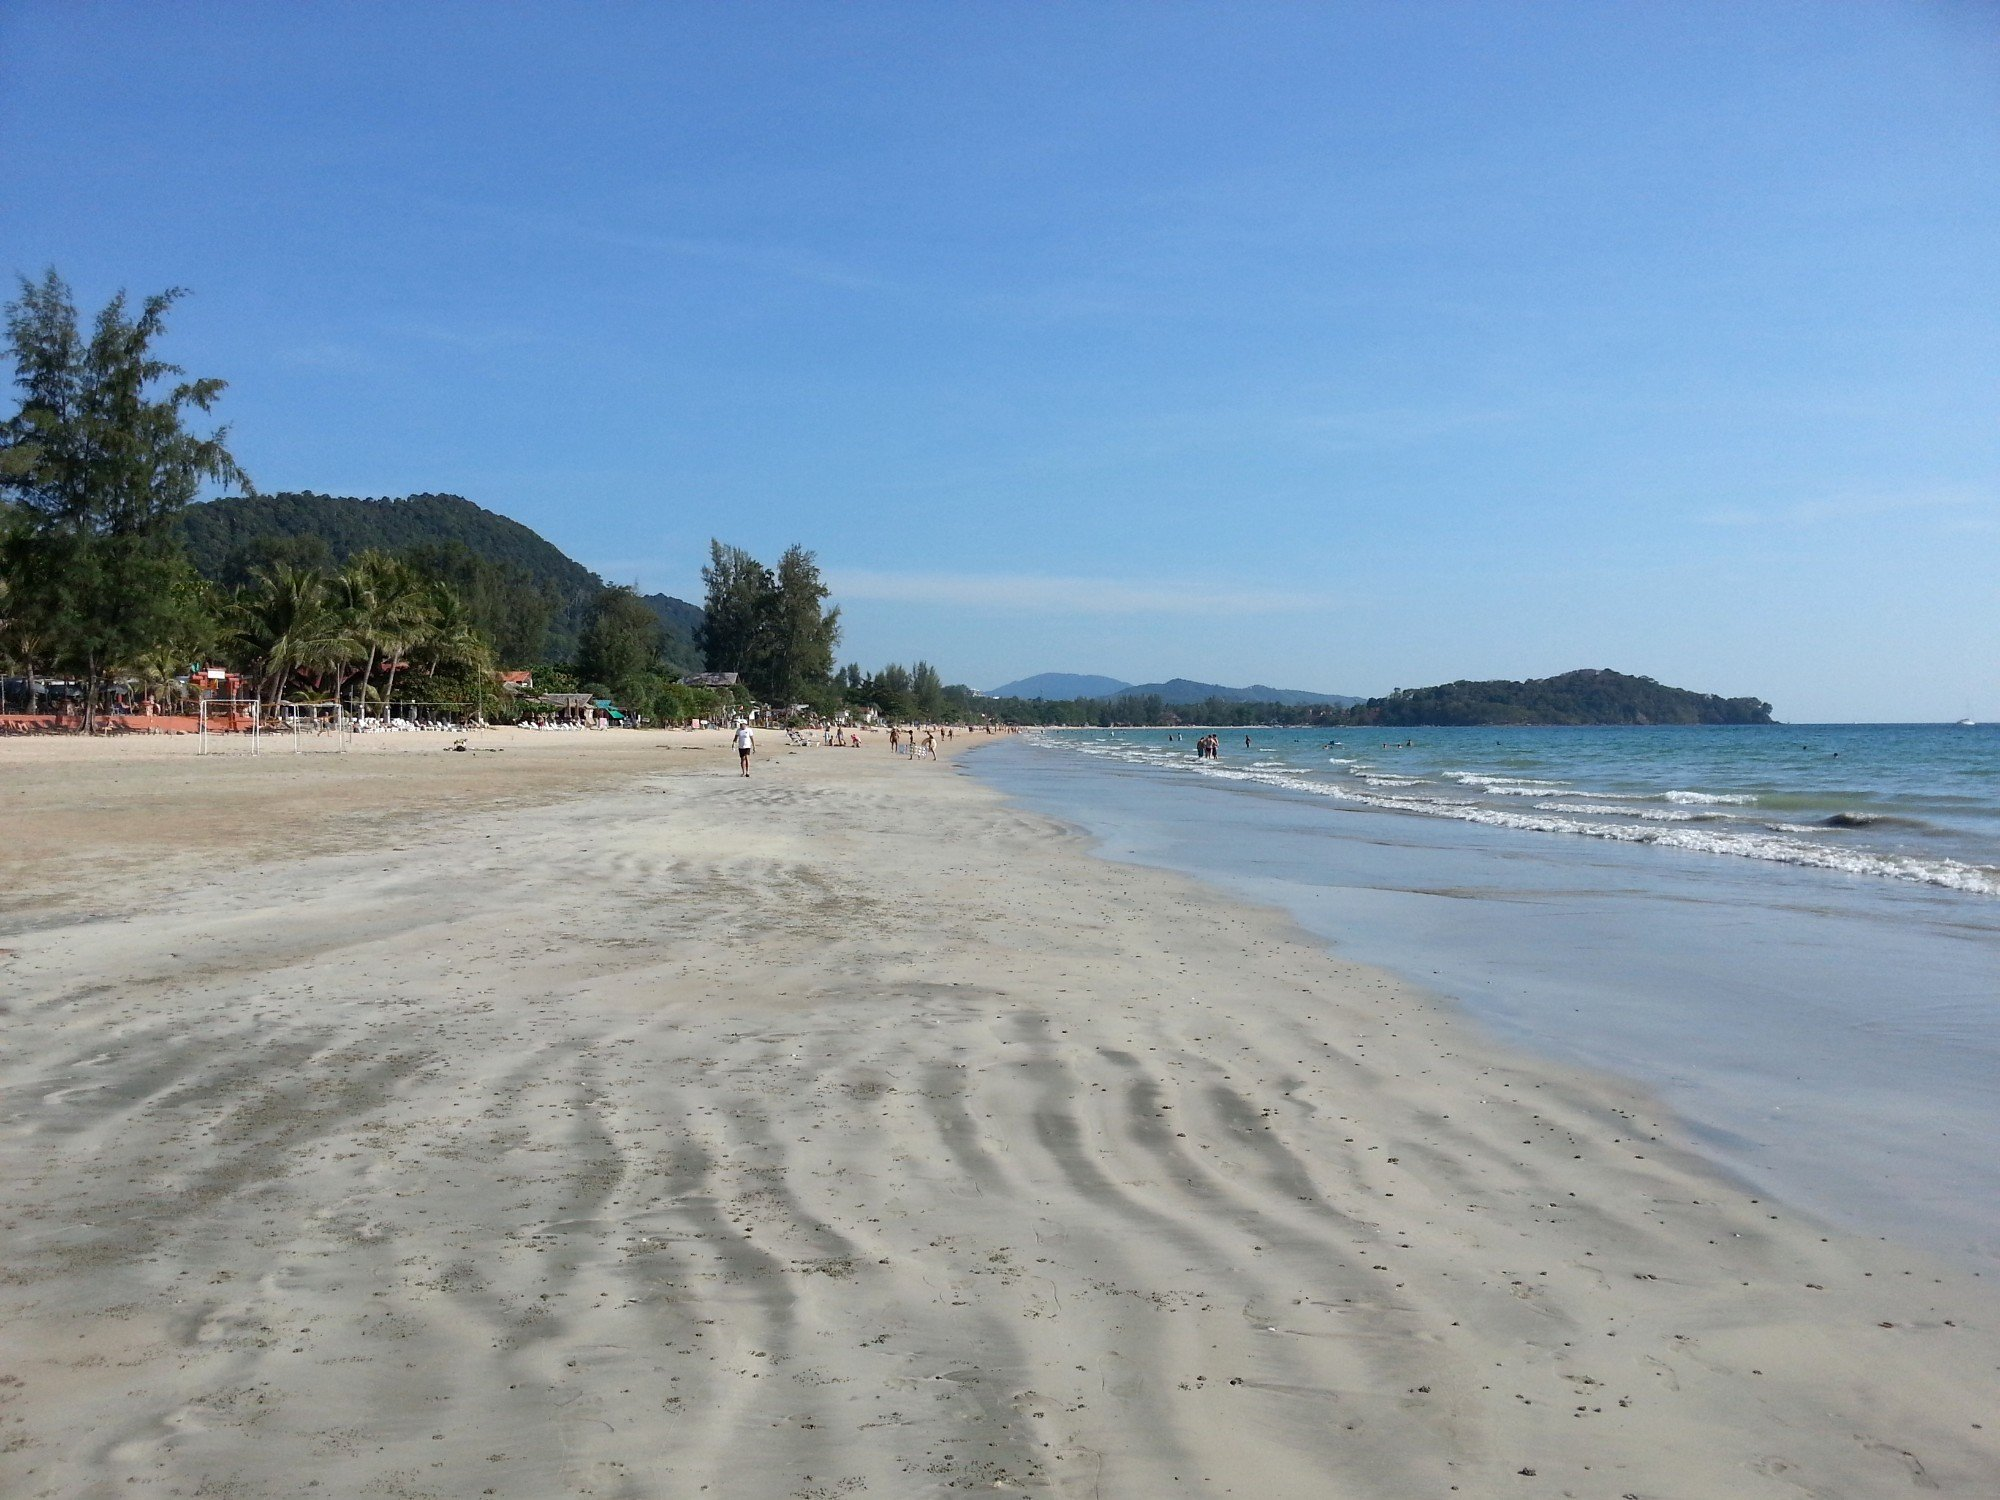 Klong Dao Beach on Koh Lanta